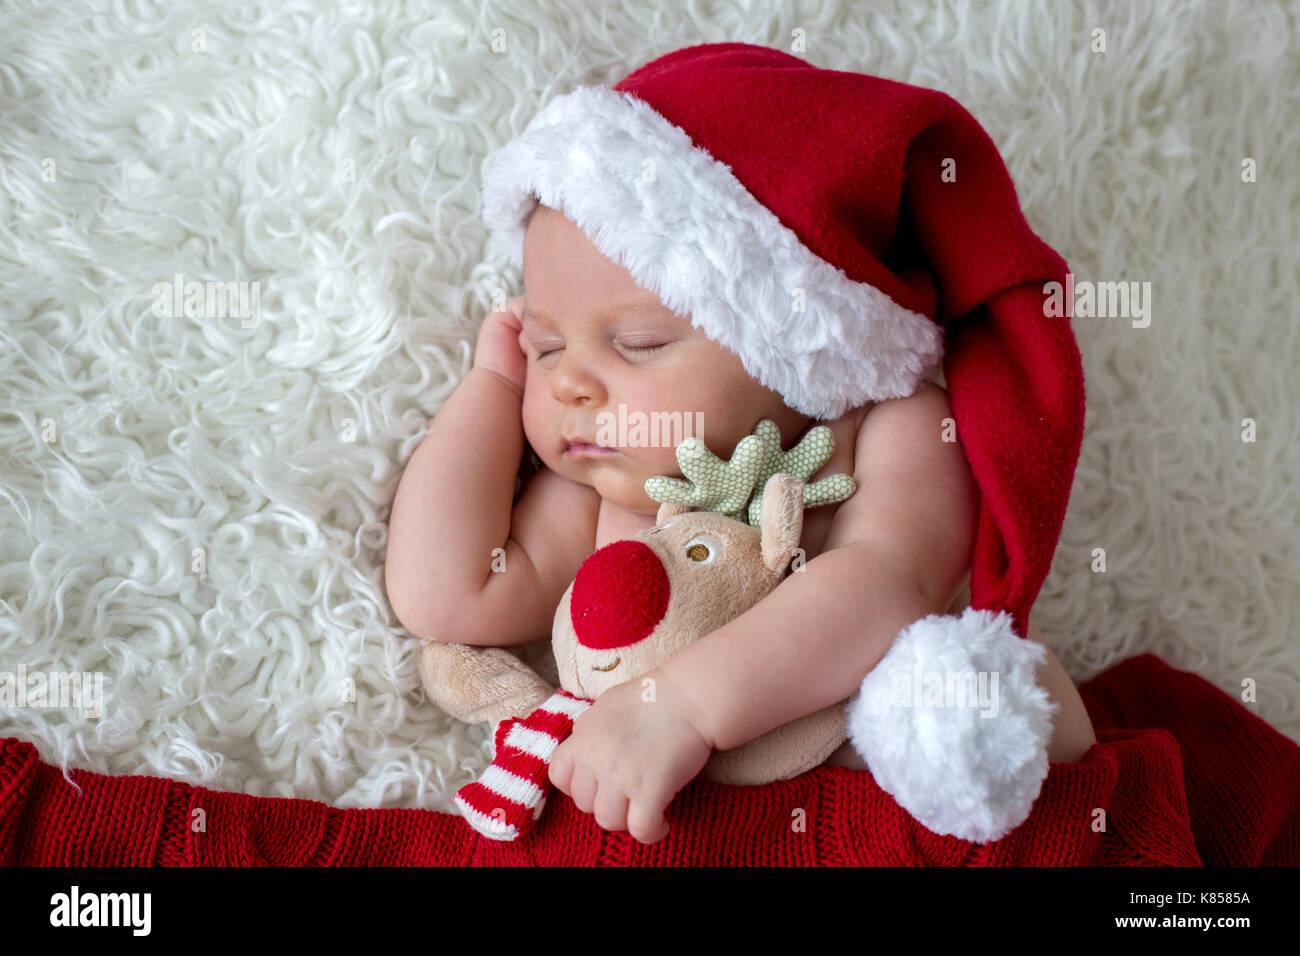 3c43d451f Little sleeping newborn baby boy, wearing Santa hat and pants Stock ...